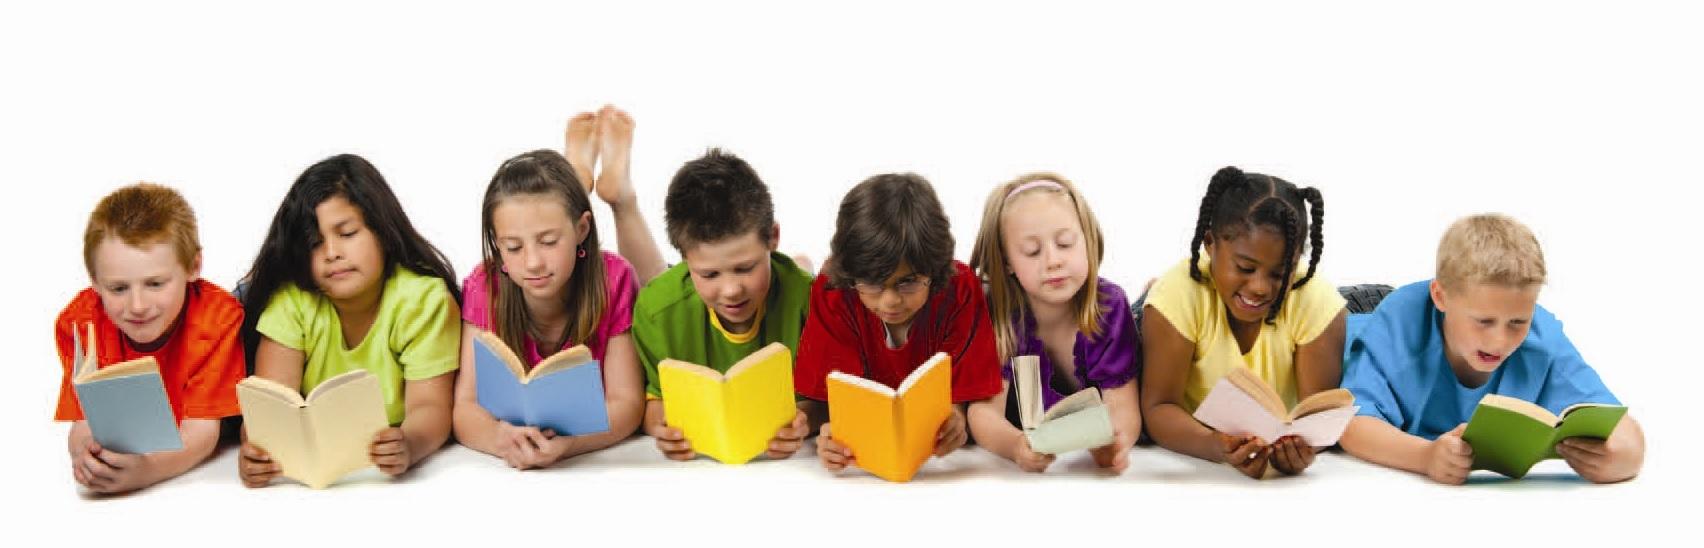 Consciencia Visual - terapia intensiva para lectura